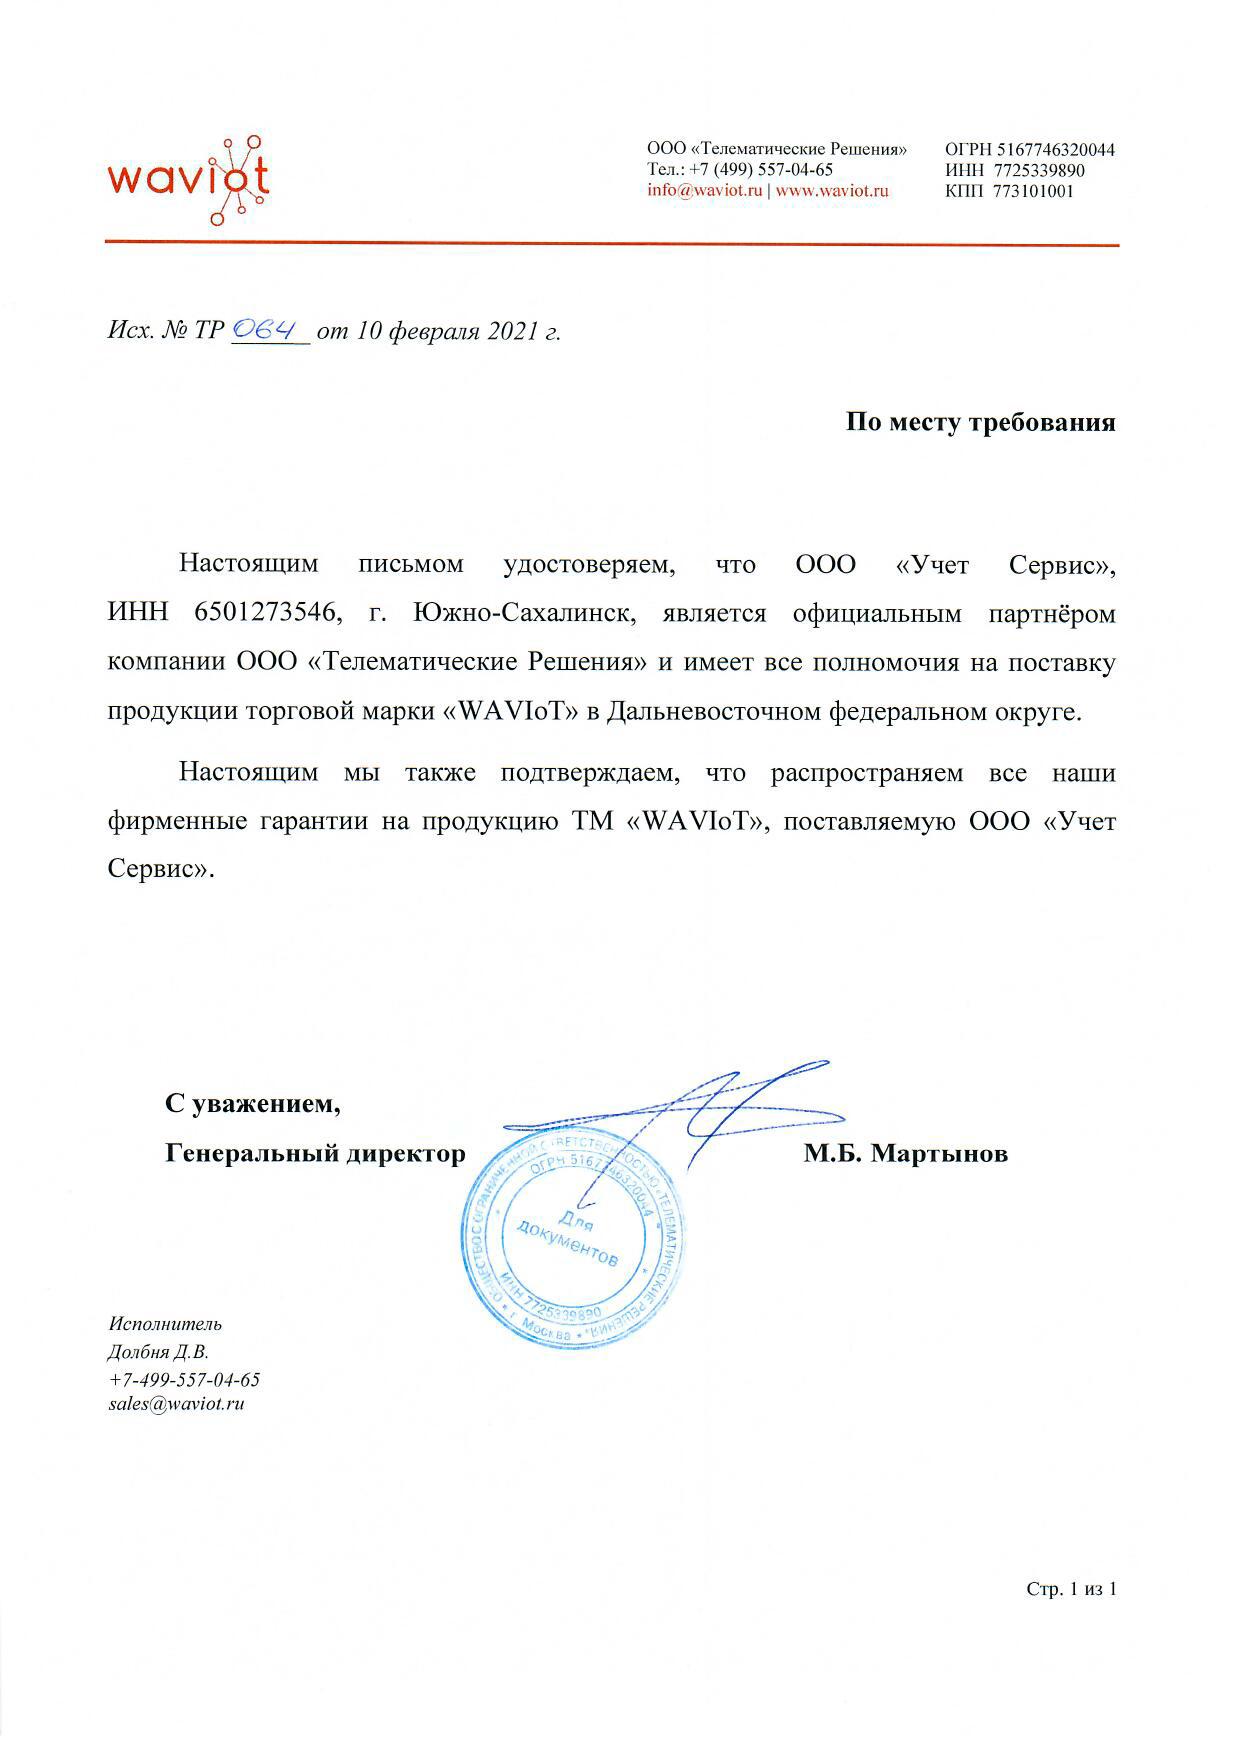 Сертификат ООО